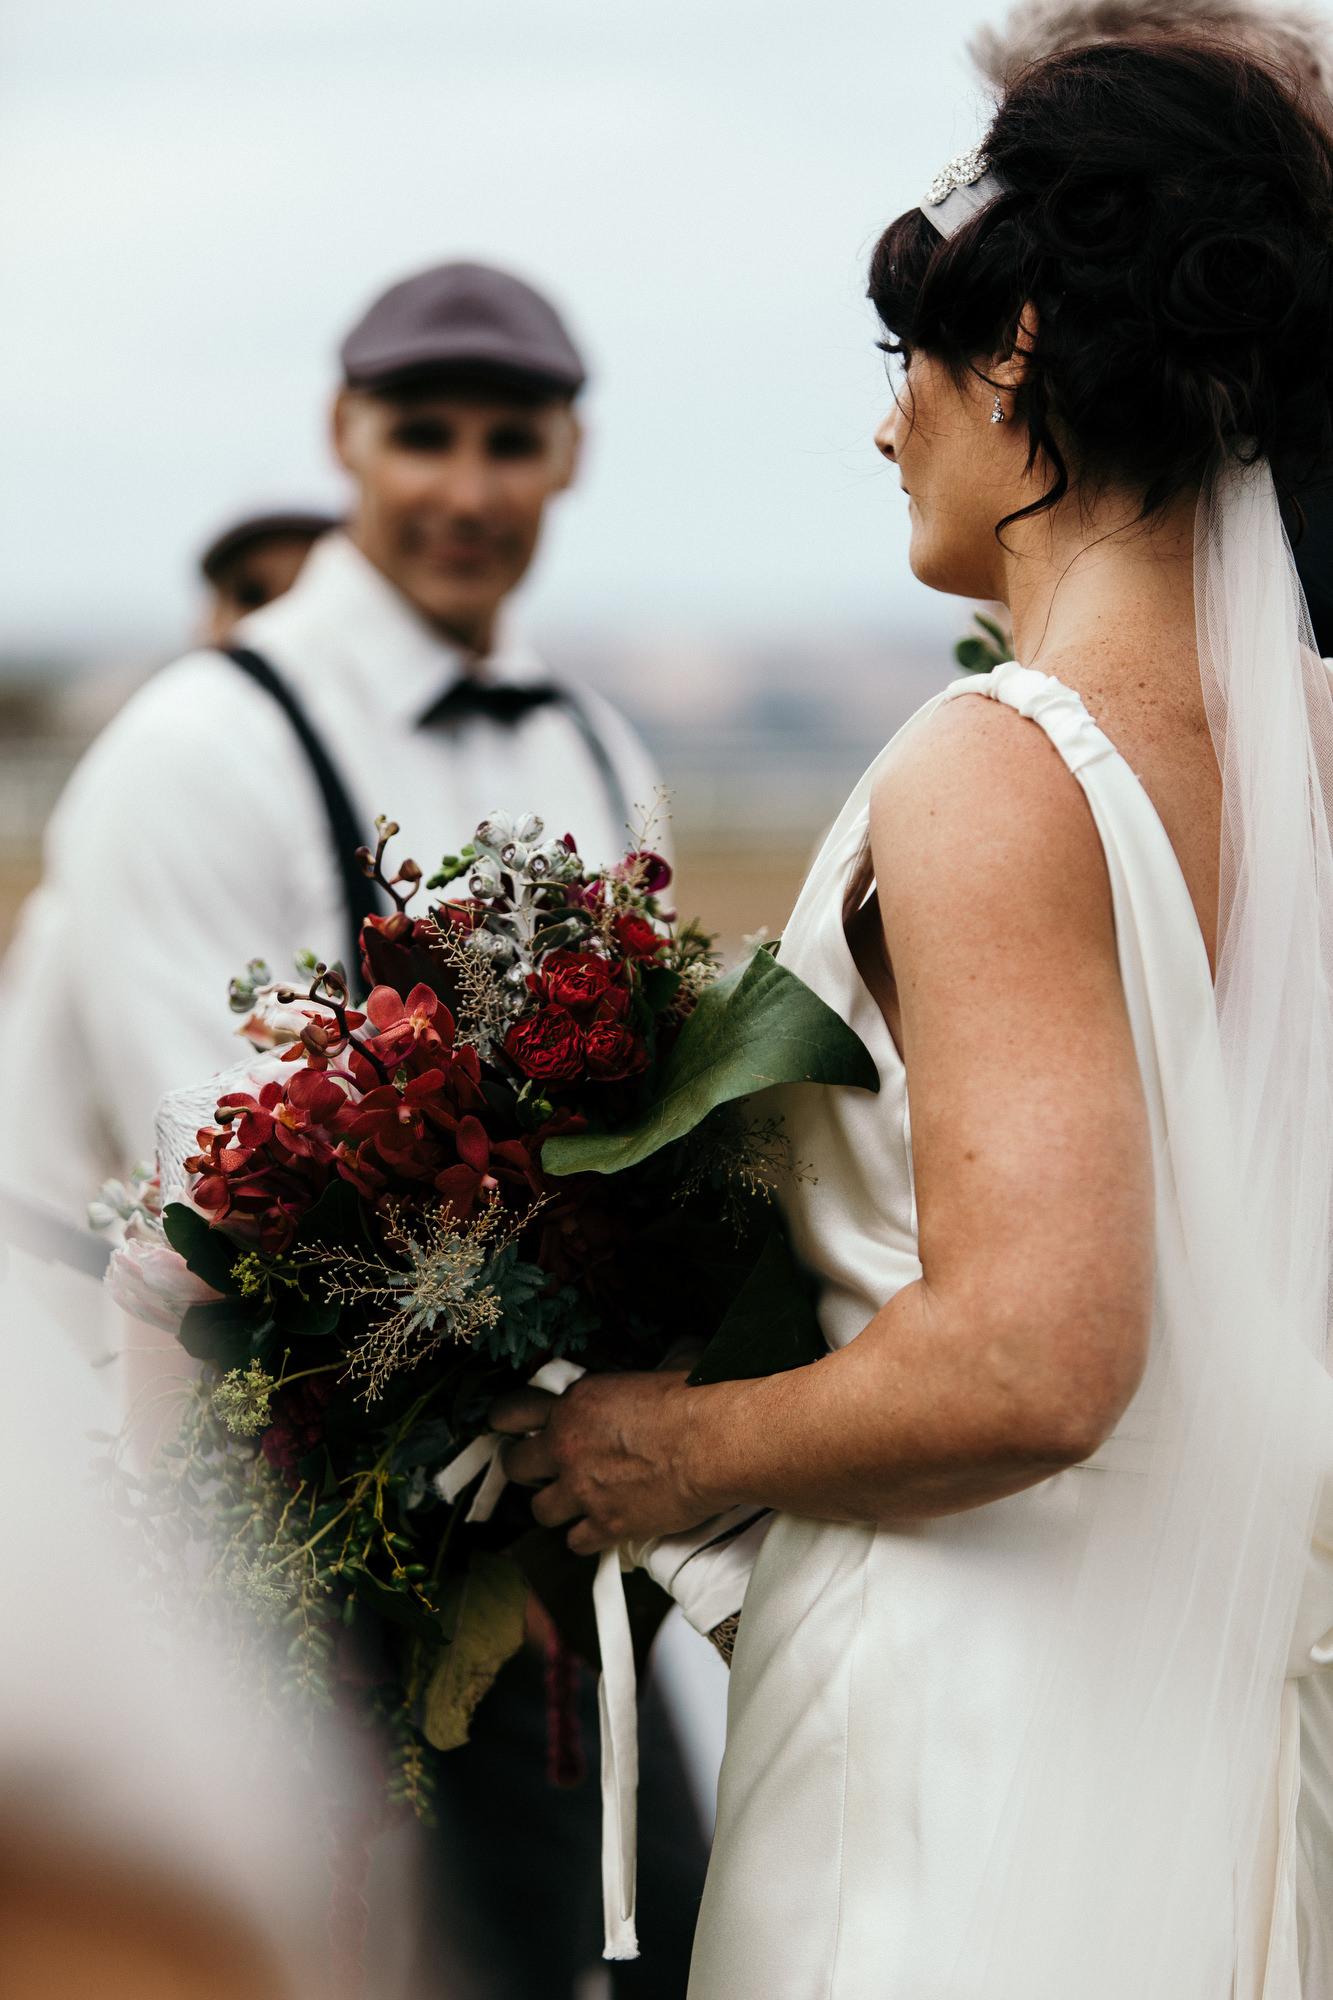 CLARK-WEDDING-EDITH-VALLEY-CARTER-ROSE-PHOTOGRAPHY-215.JPG